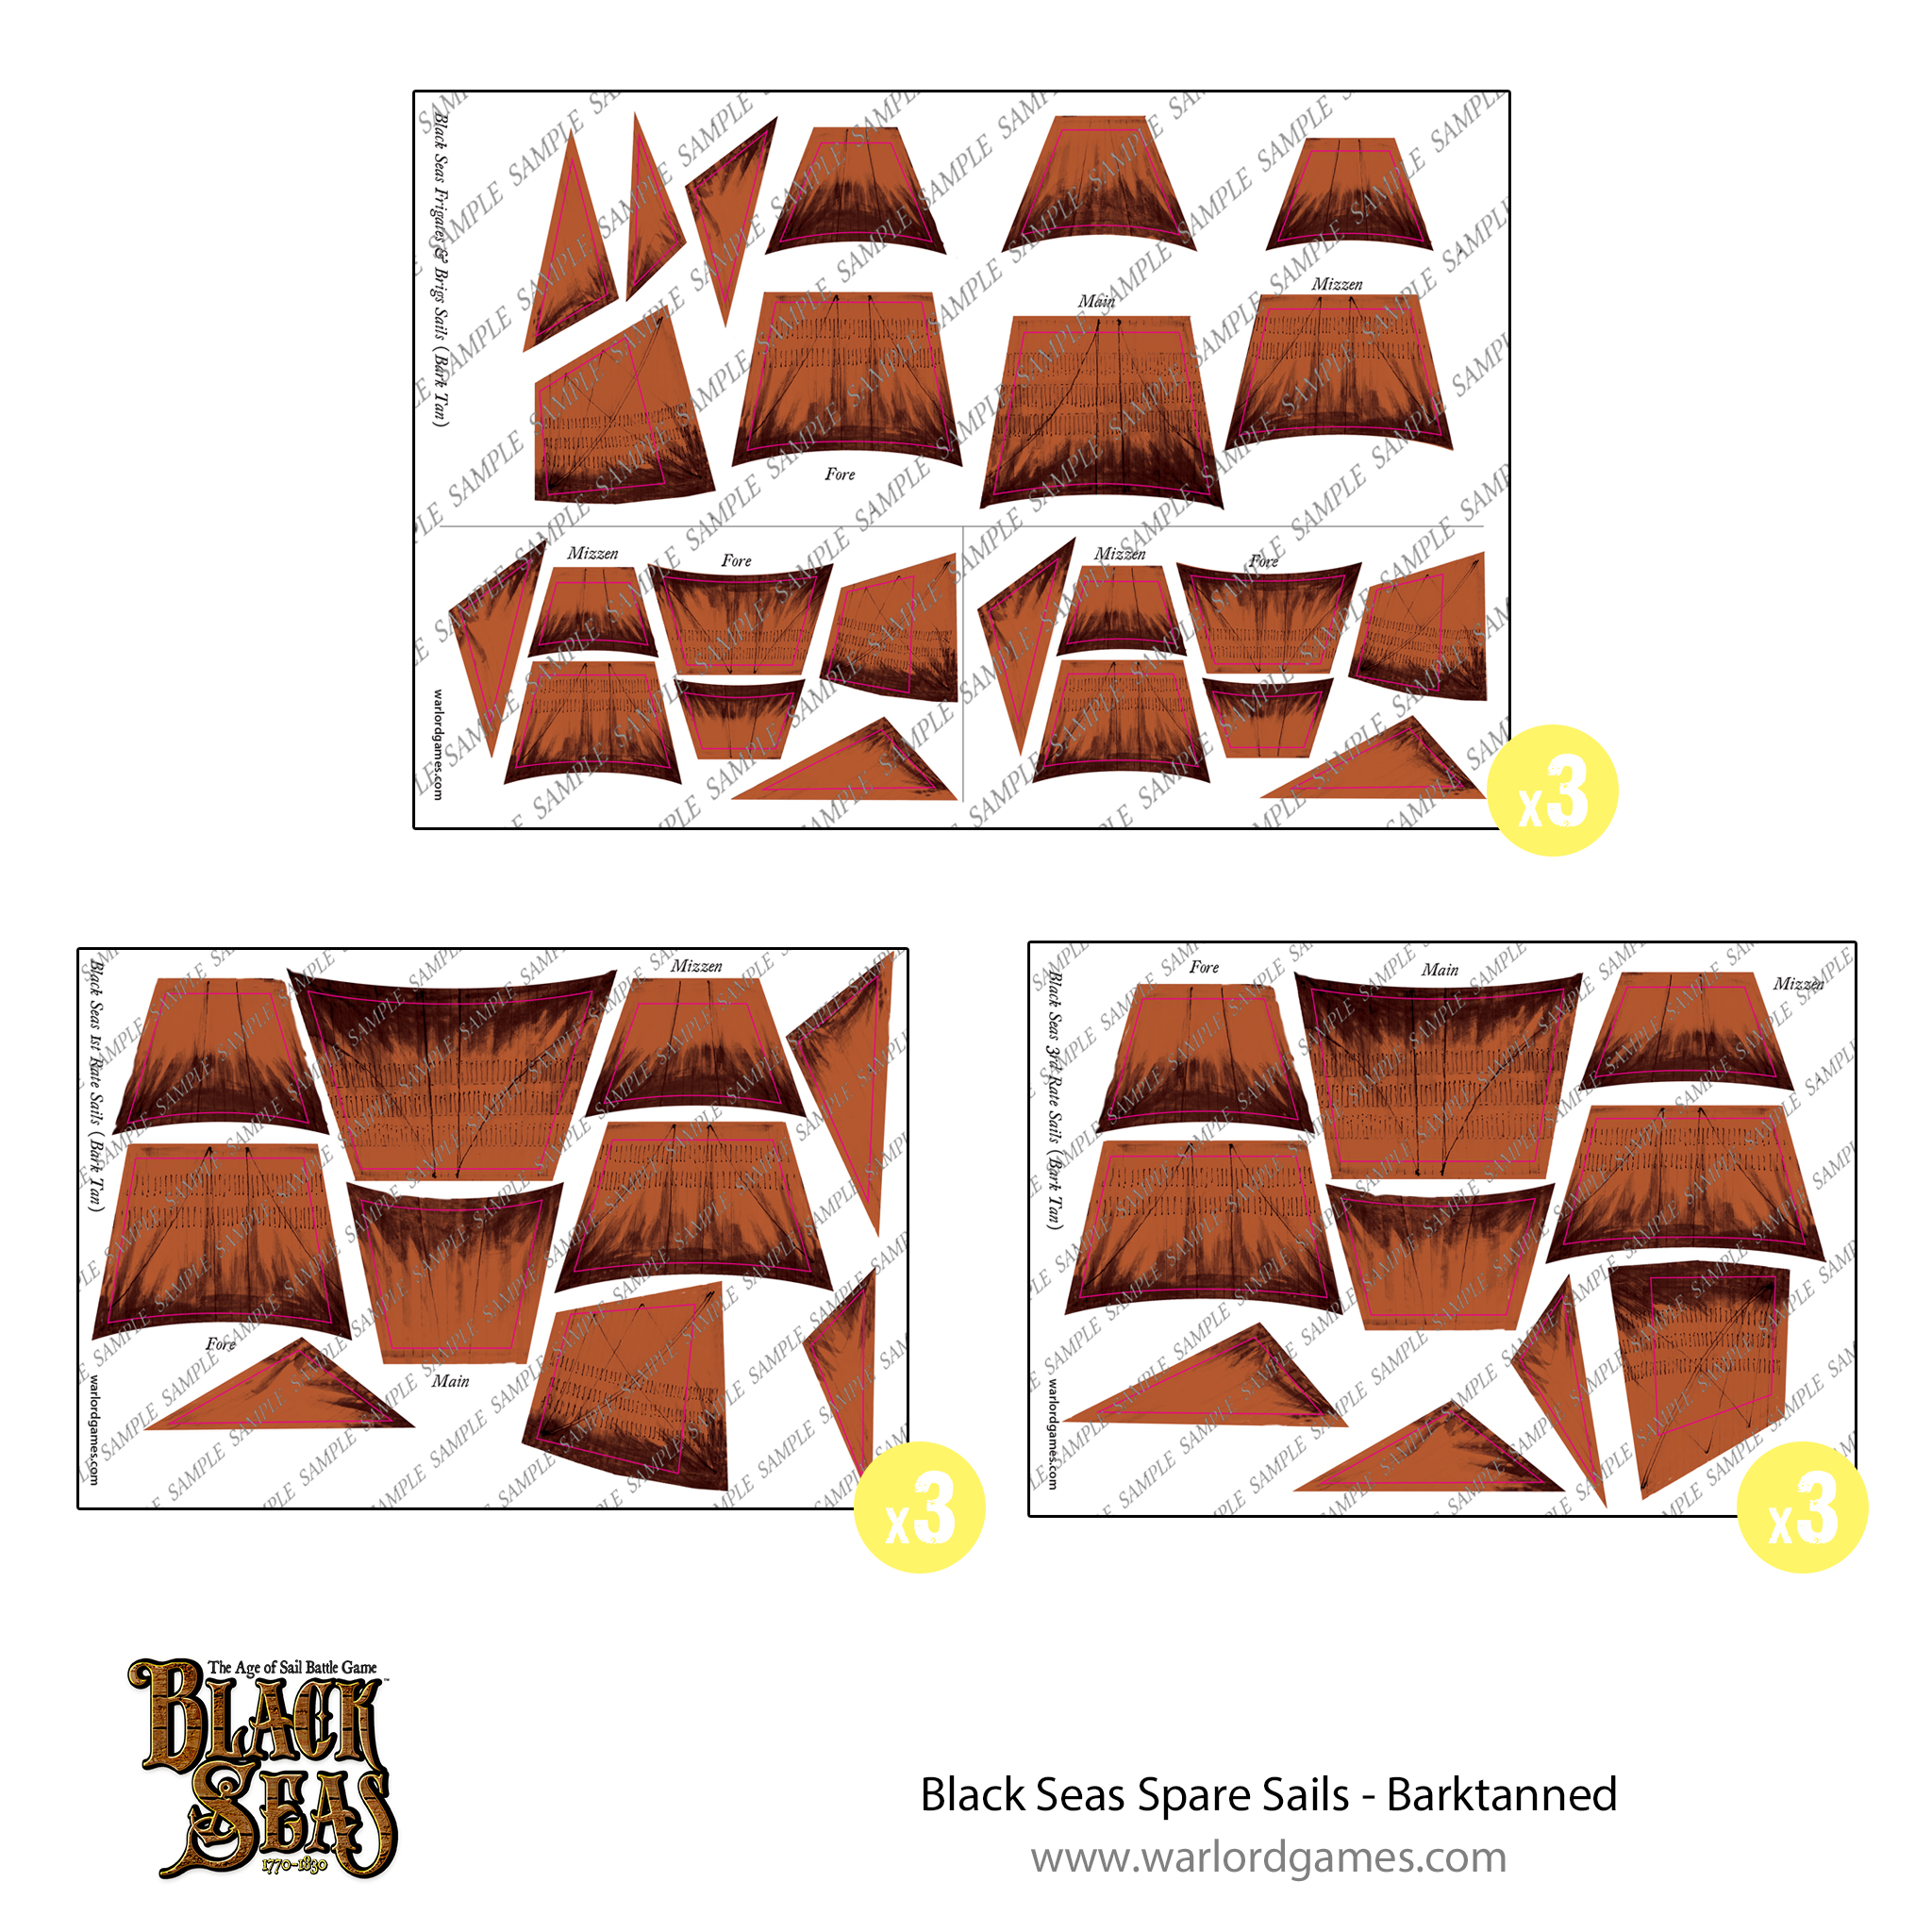 Black Seas Spare sails - barktanned